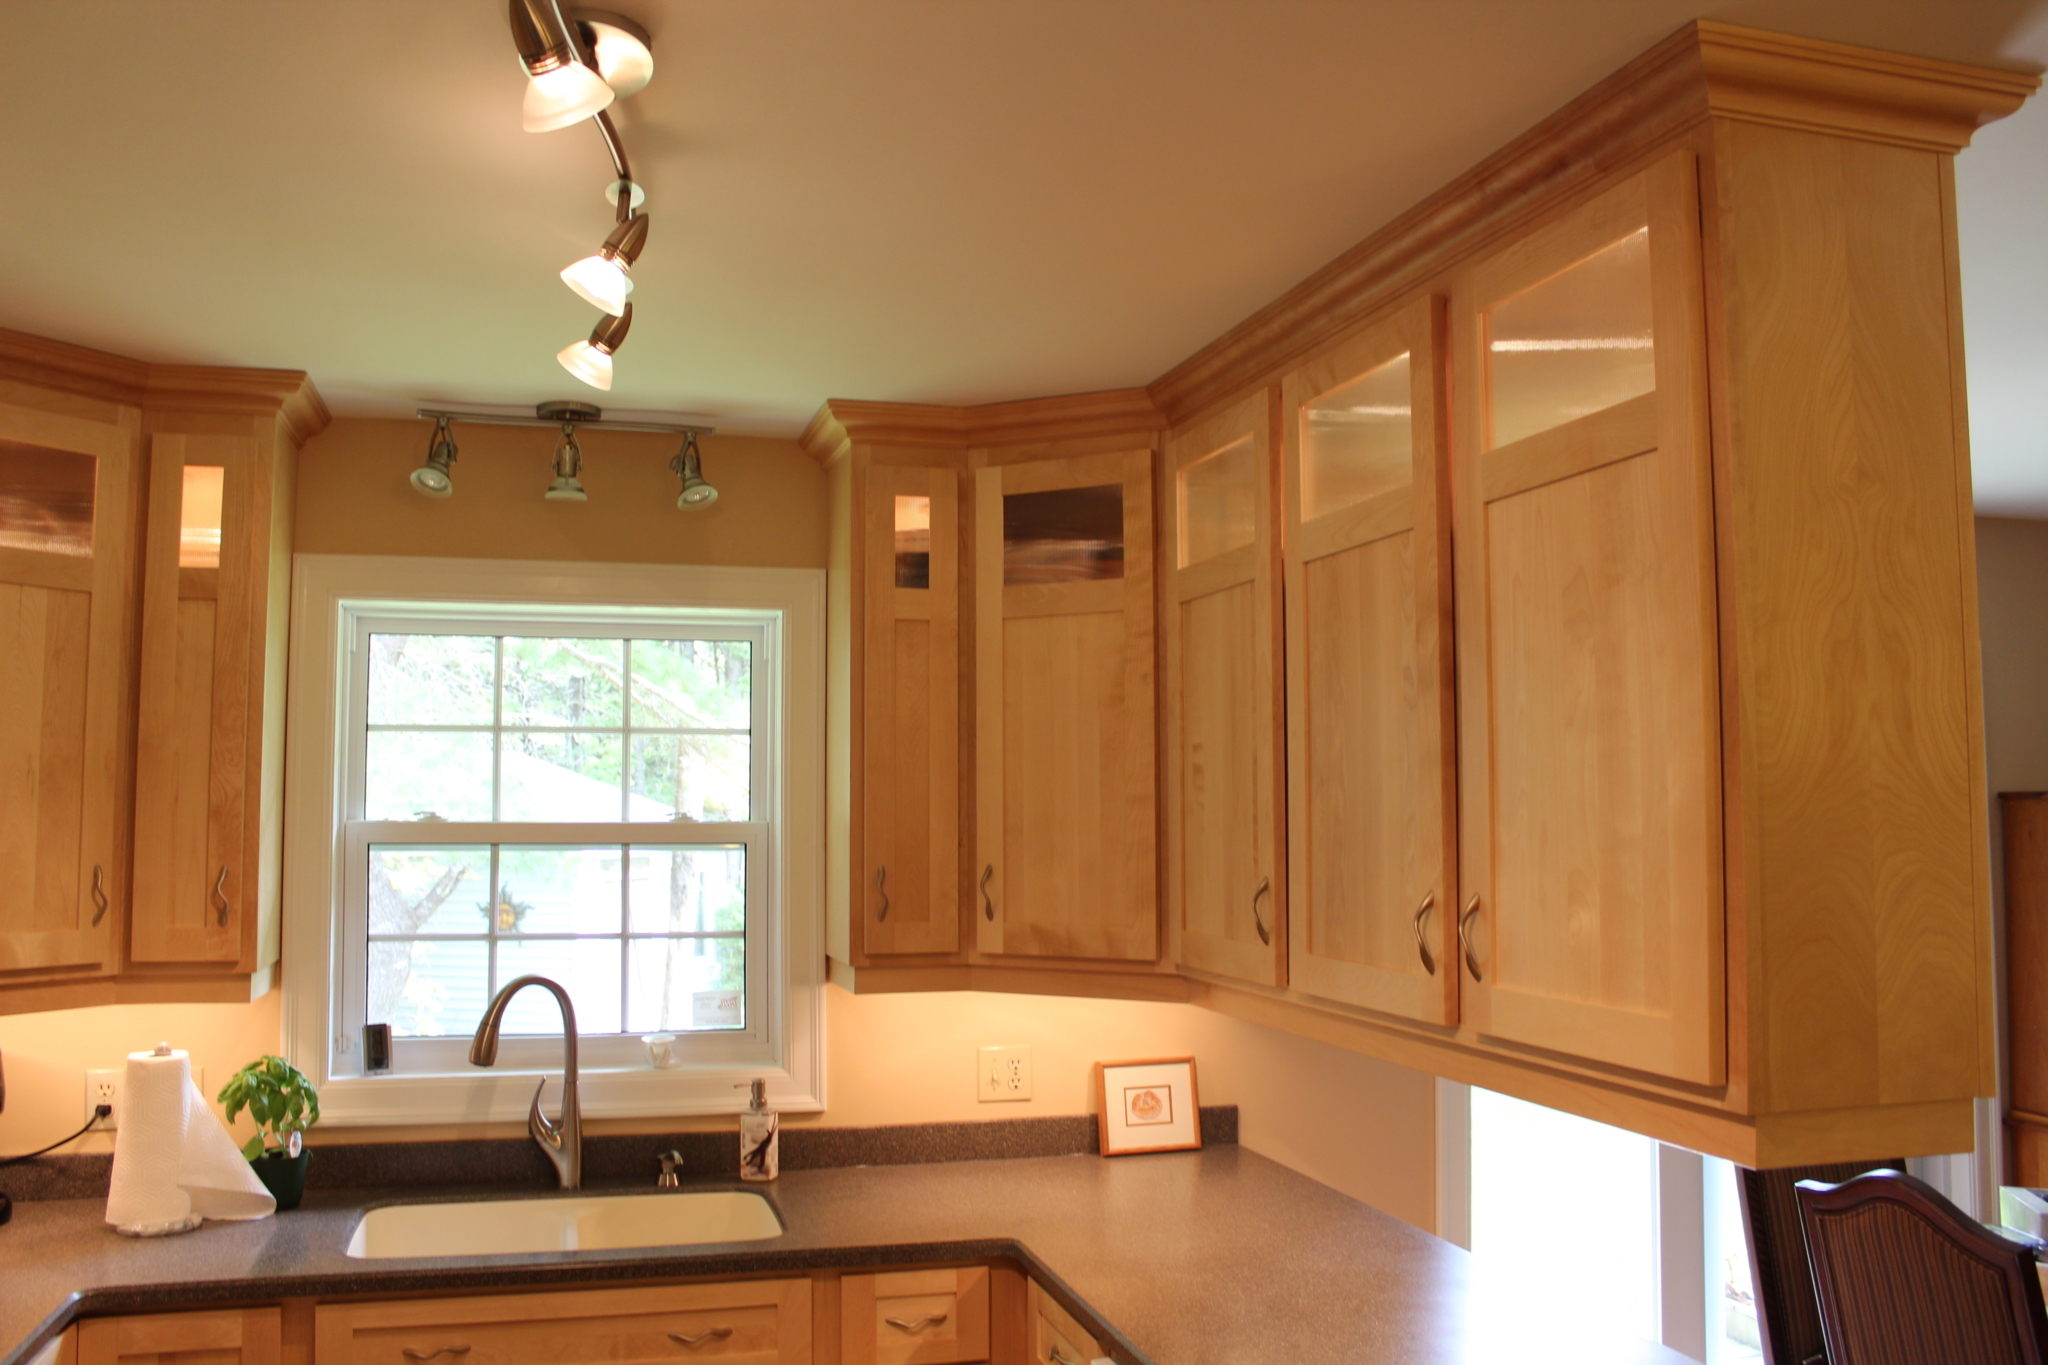 Holland Kitchen And Bathroom Design Ltd : Patti s kitchen and bath design ltd halifax ns ourbis